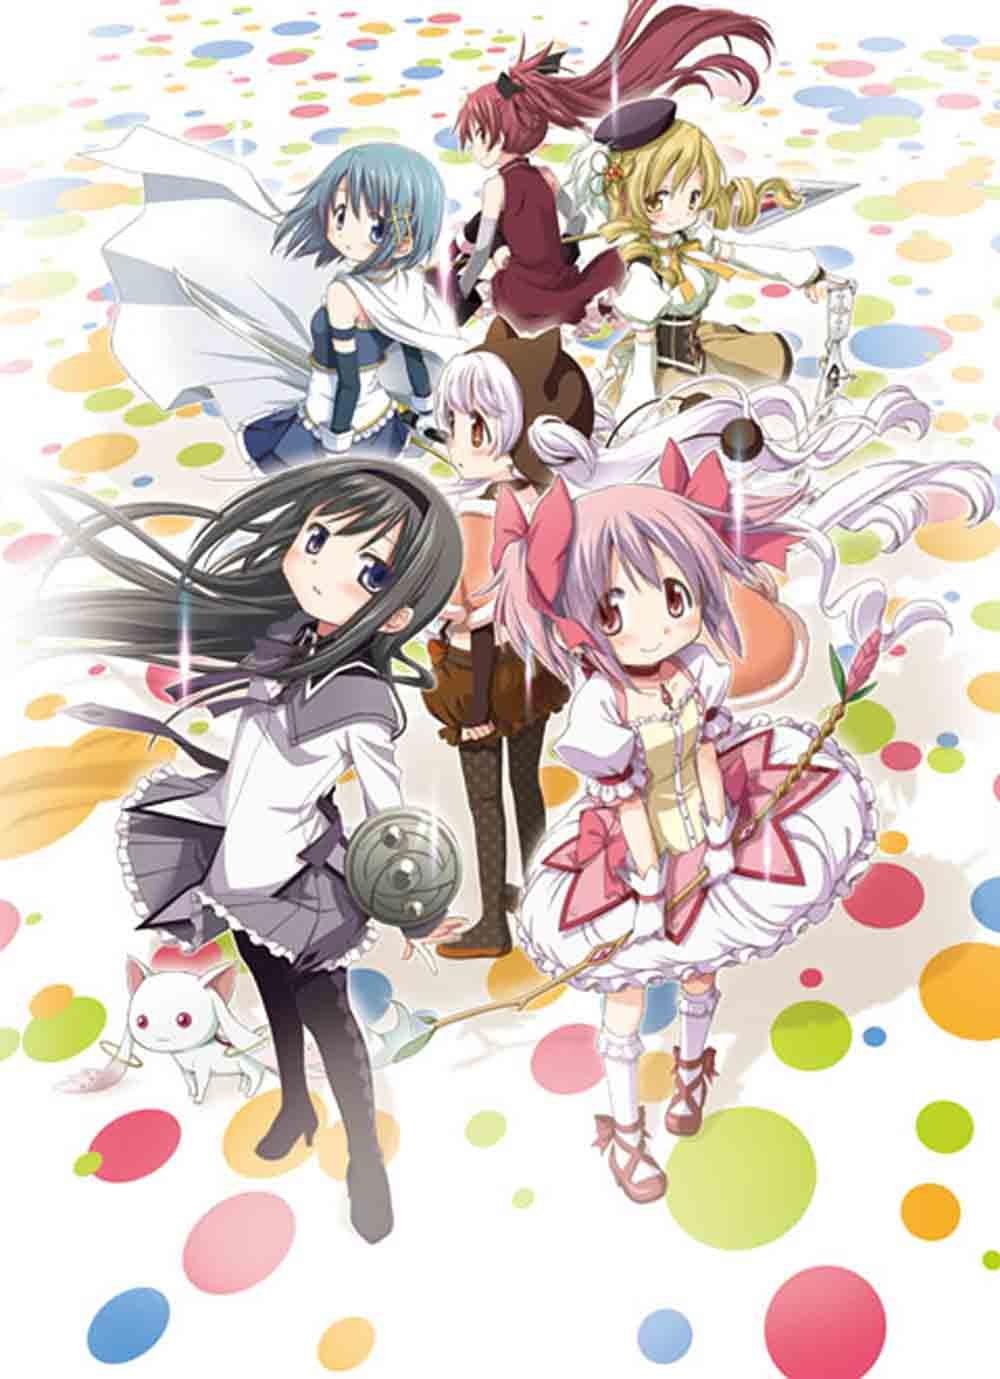 Puella Magi Madoka Magica the Movie / [Shinpen] Ha [Blu-ray] by Imports